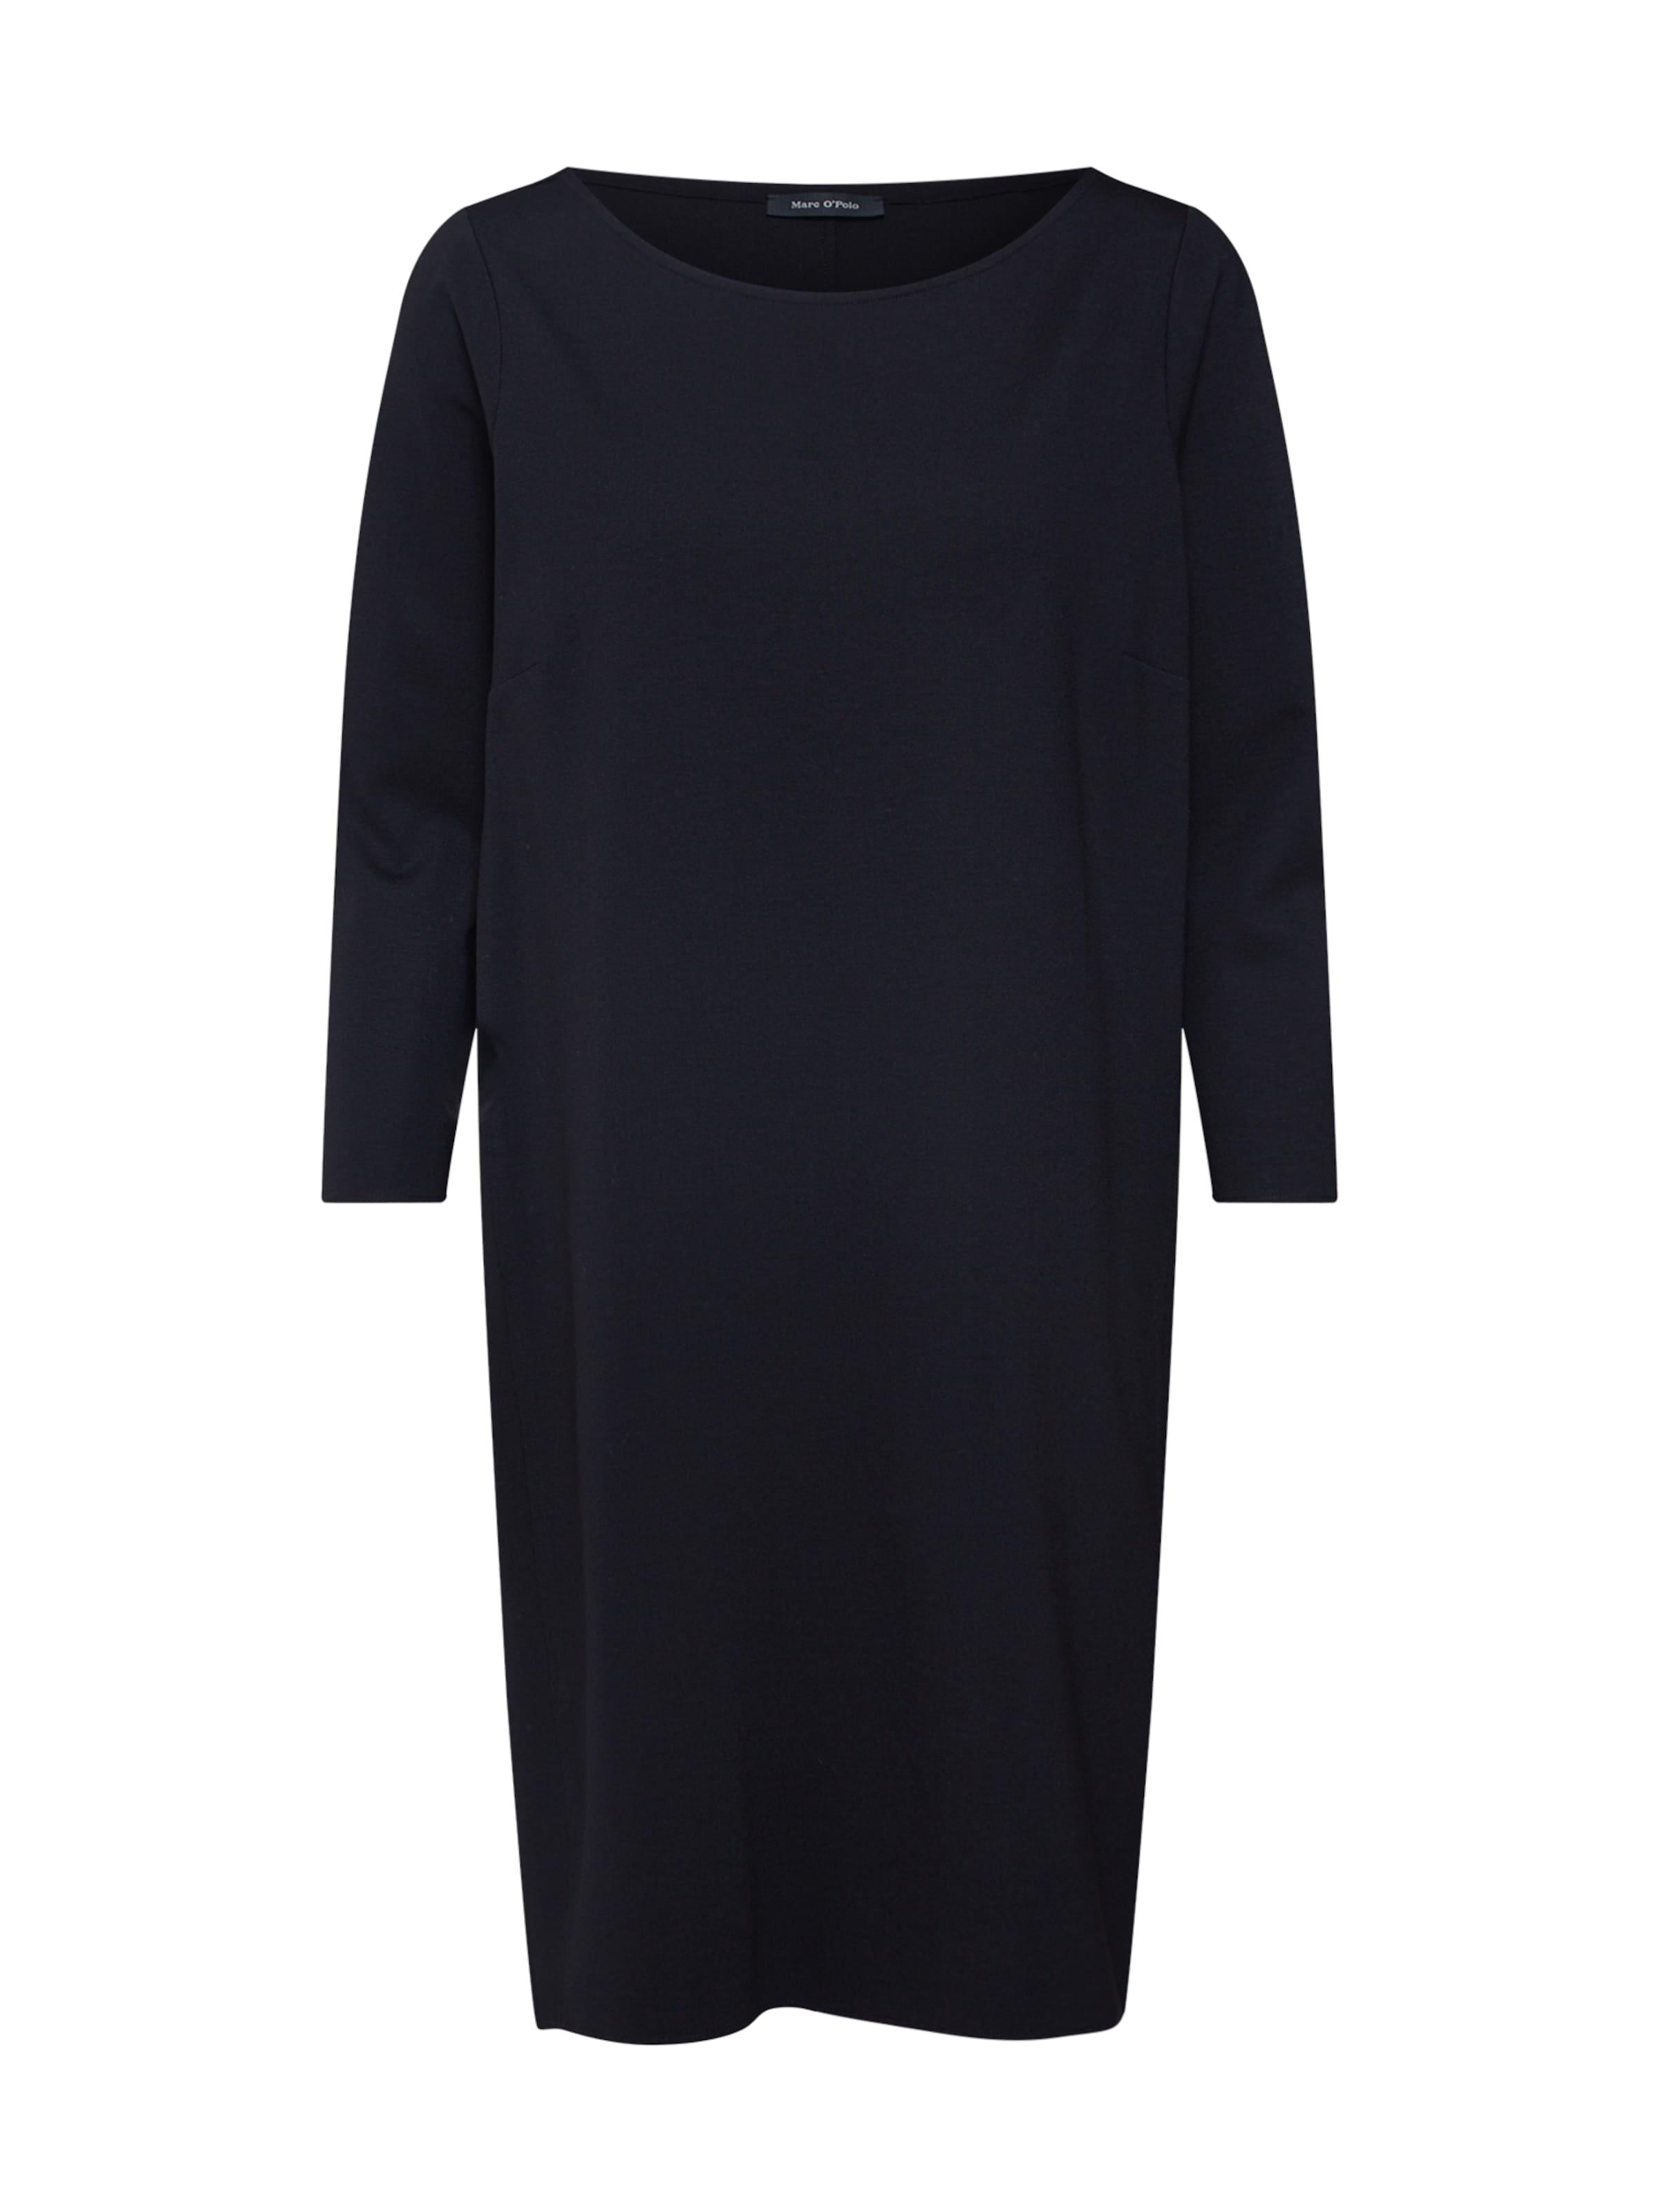 Robe Marc Dresses' Noir En O'polo 'jersey thdroQxBsC